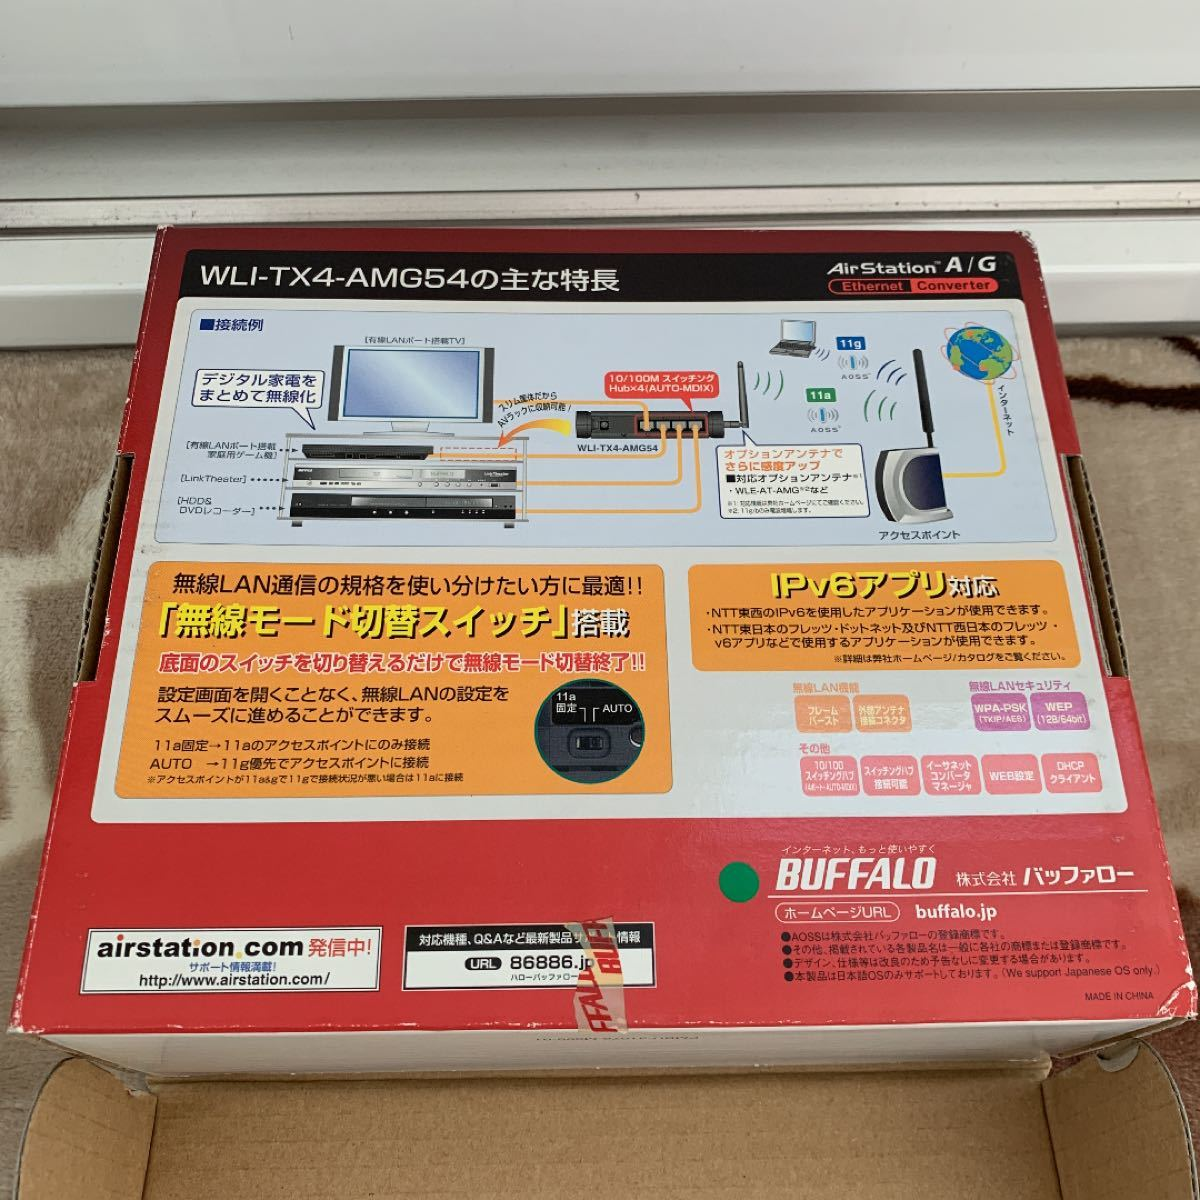 BUFFALO 無線LANイーサーネットコンバータ(無線->有線LANx4)